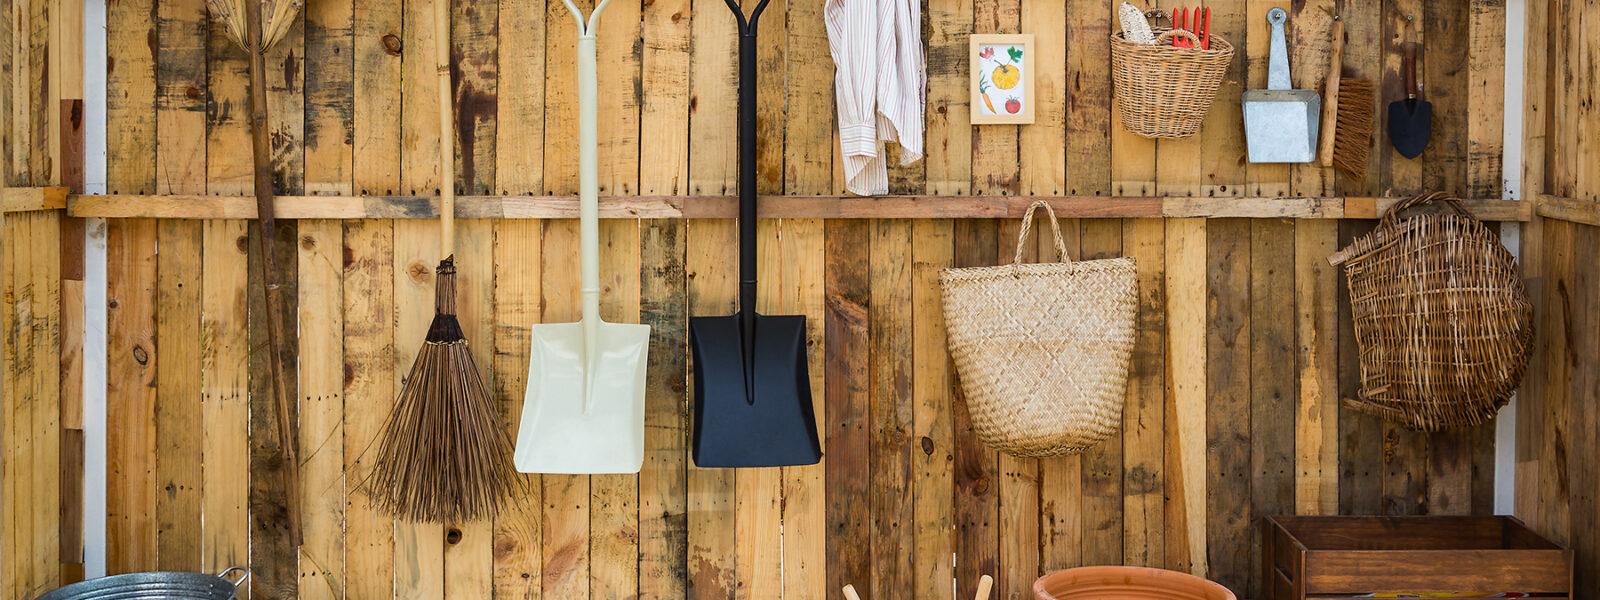 Creative Shed Interior Ideas For 2021 Beachy Barns